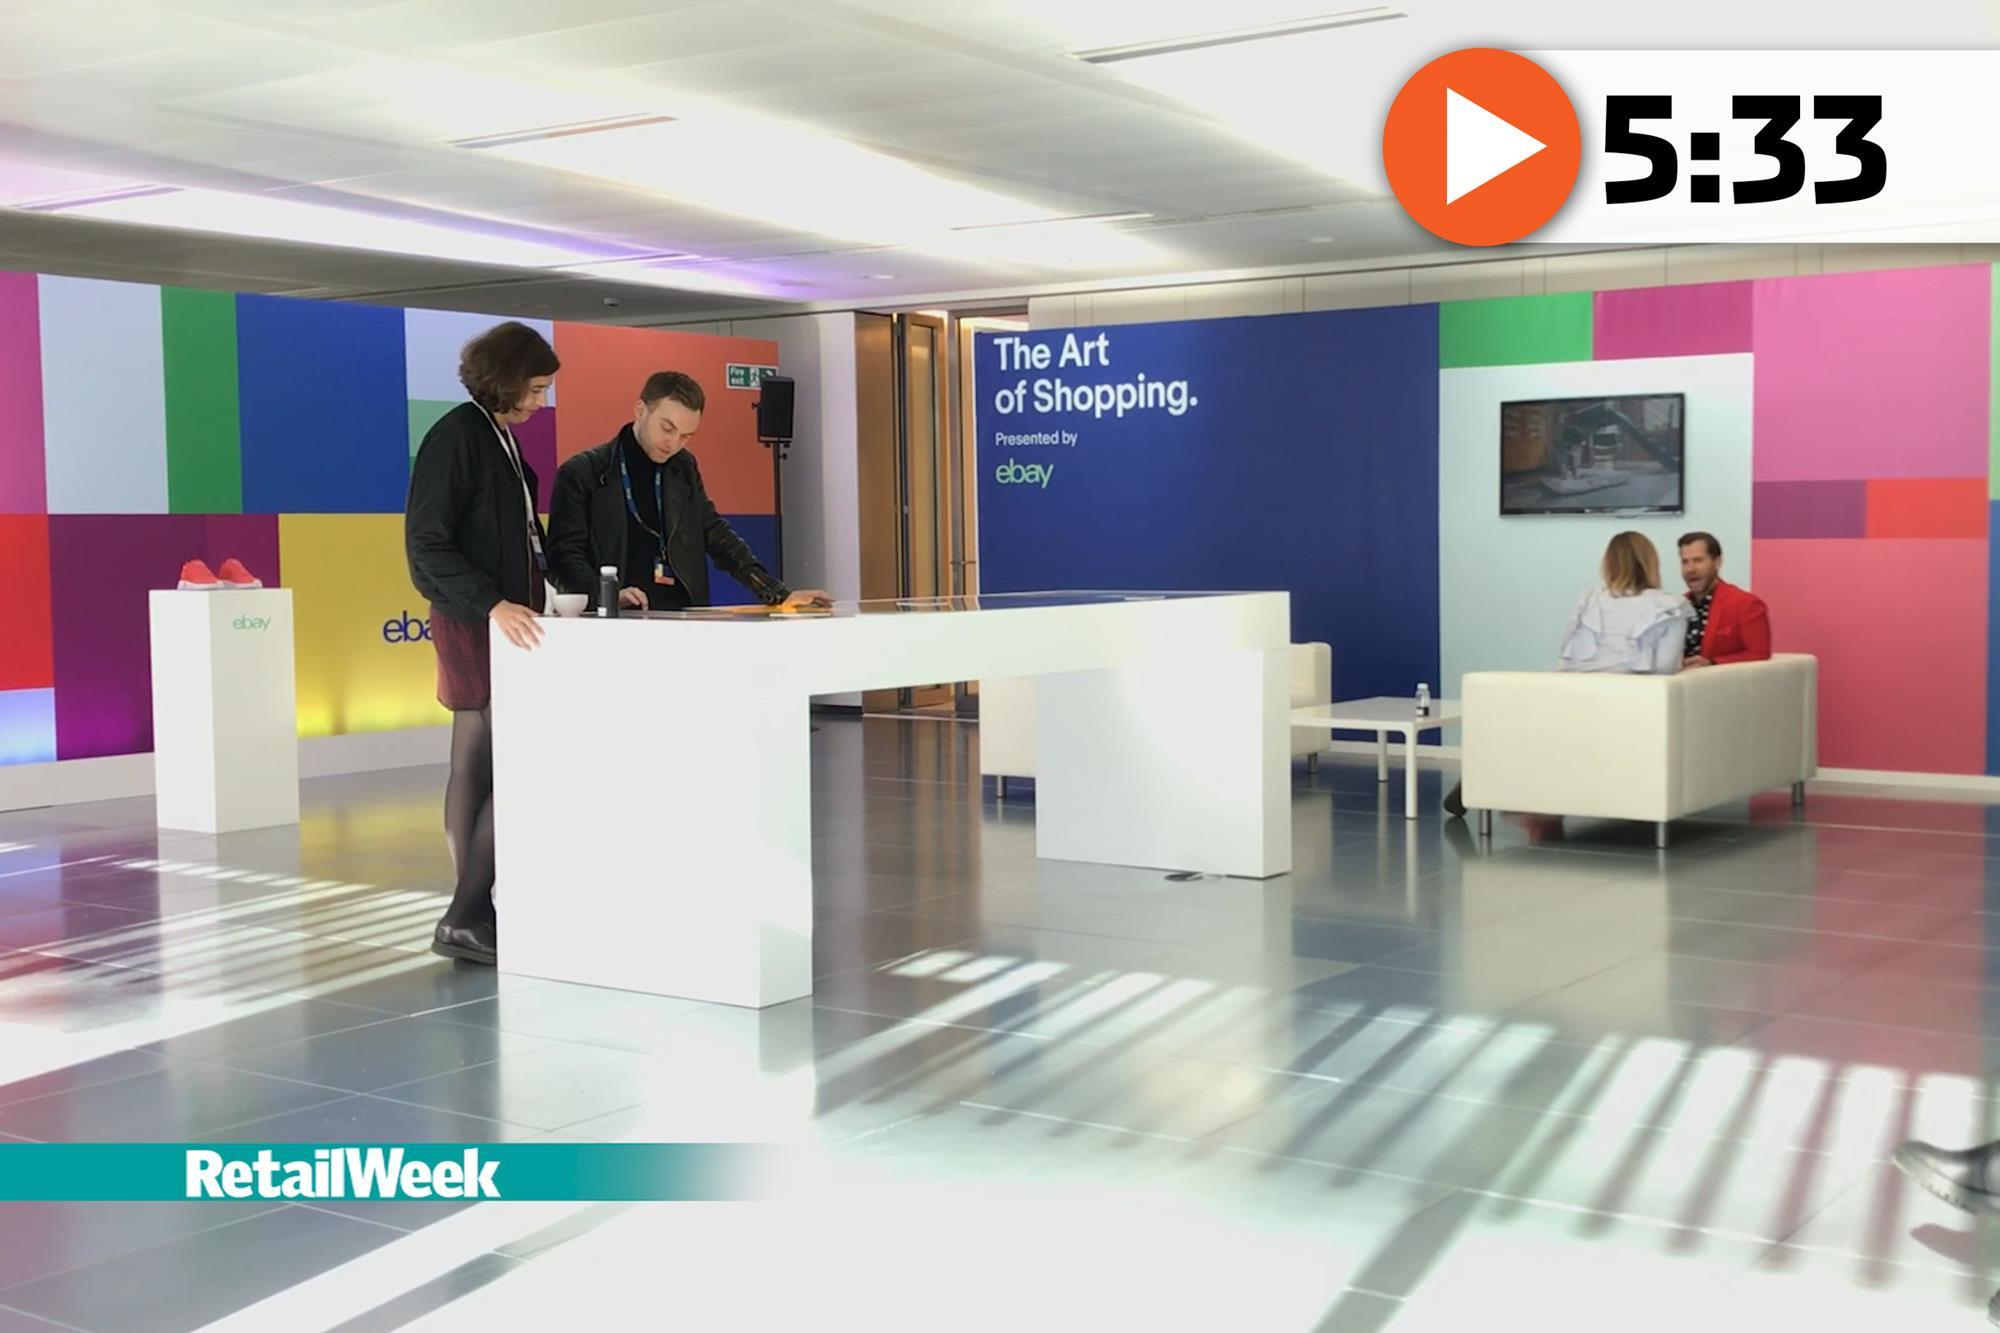 ebay head office. watch ebay showcases subconscious shopping experience video retail week ebay head office